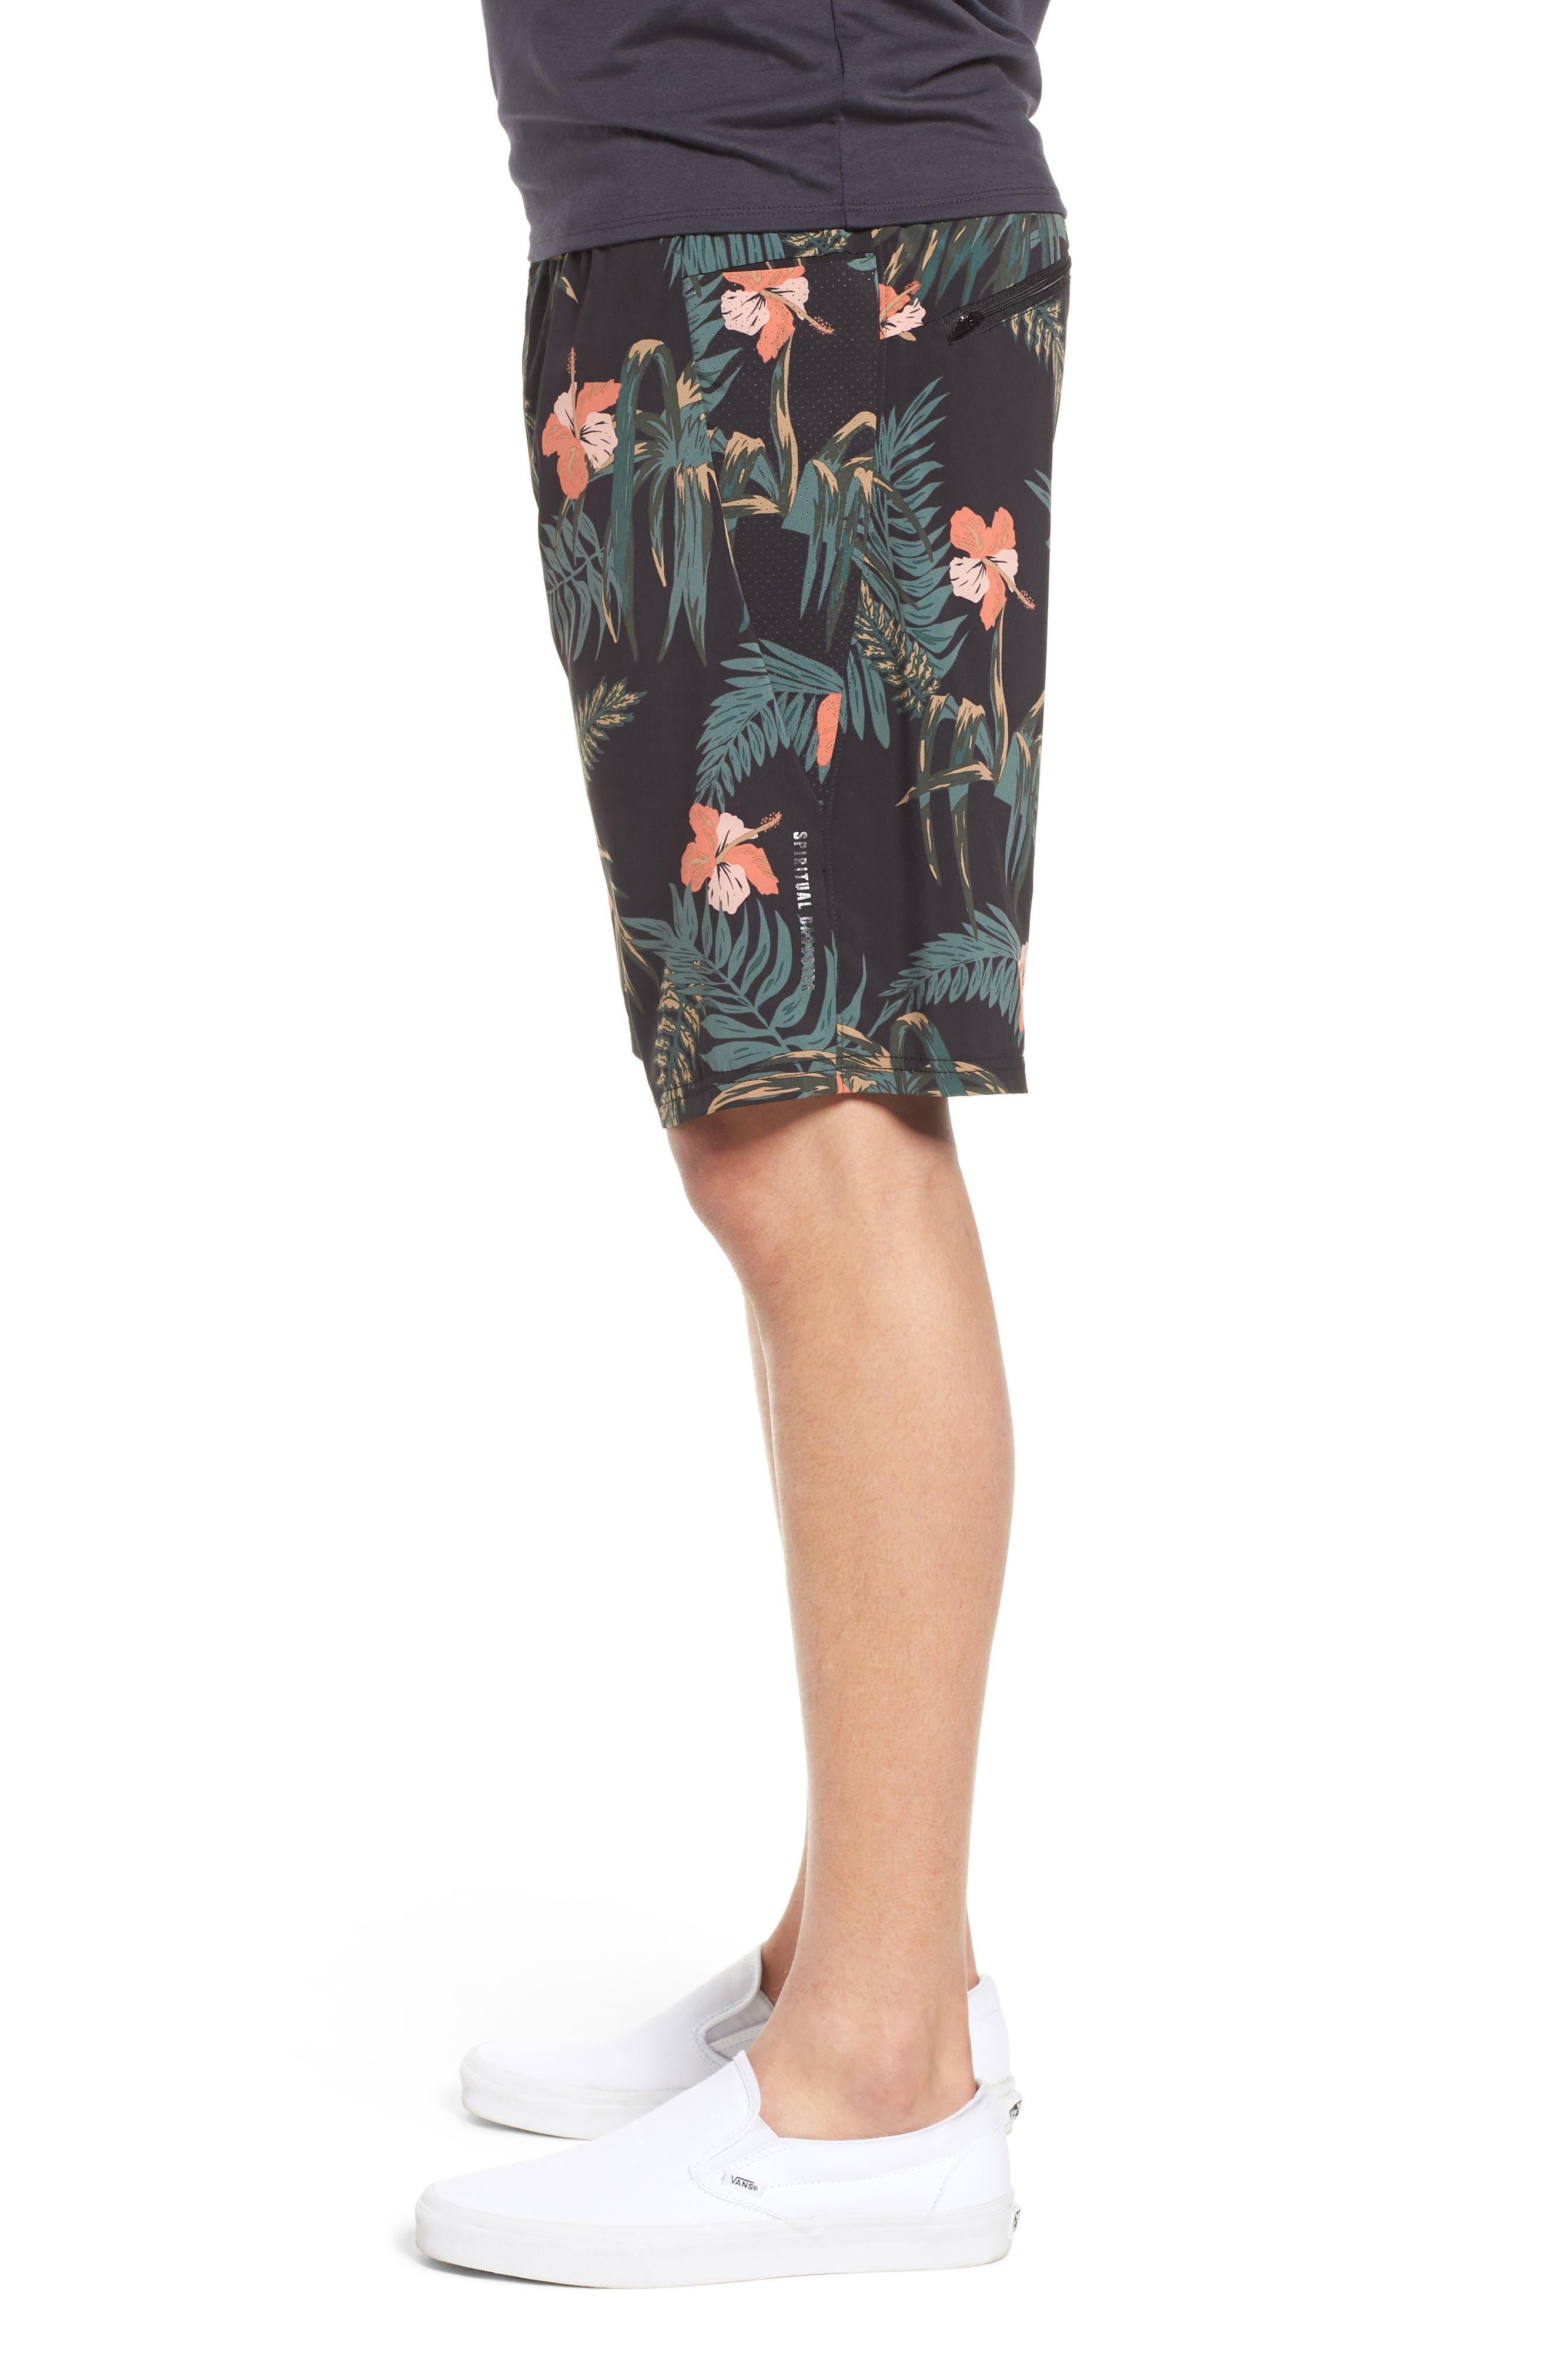 Ignite Shorts,                             Alternate thumbnail 3, color,                             Floral/ Multi